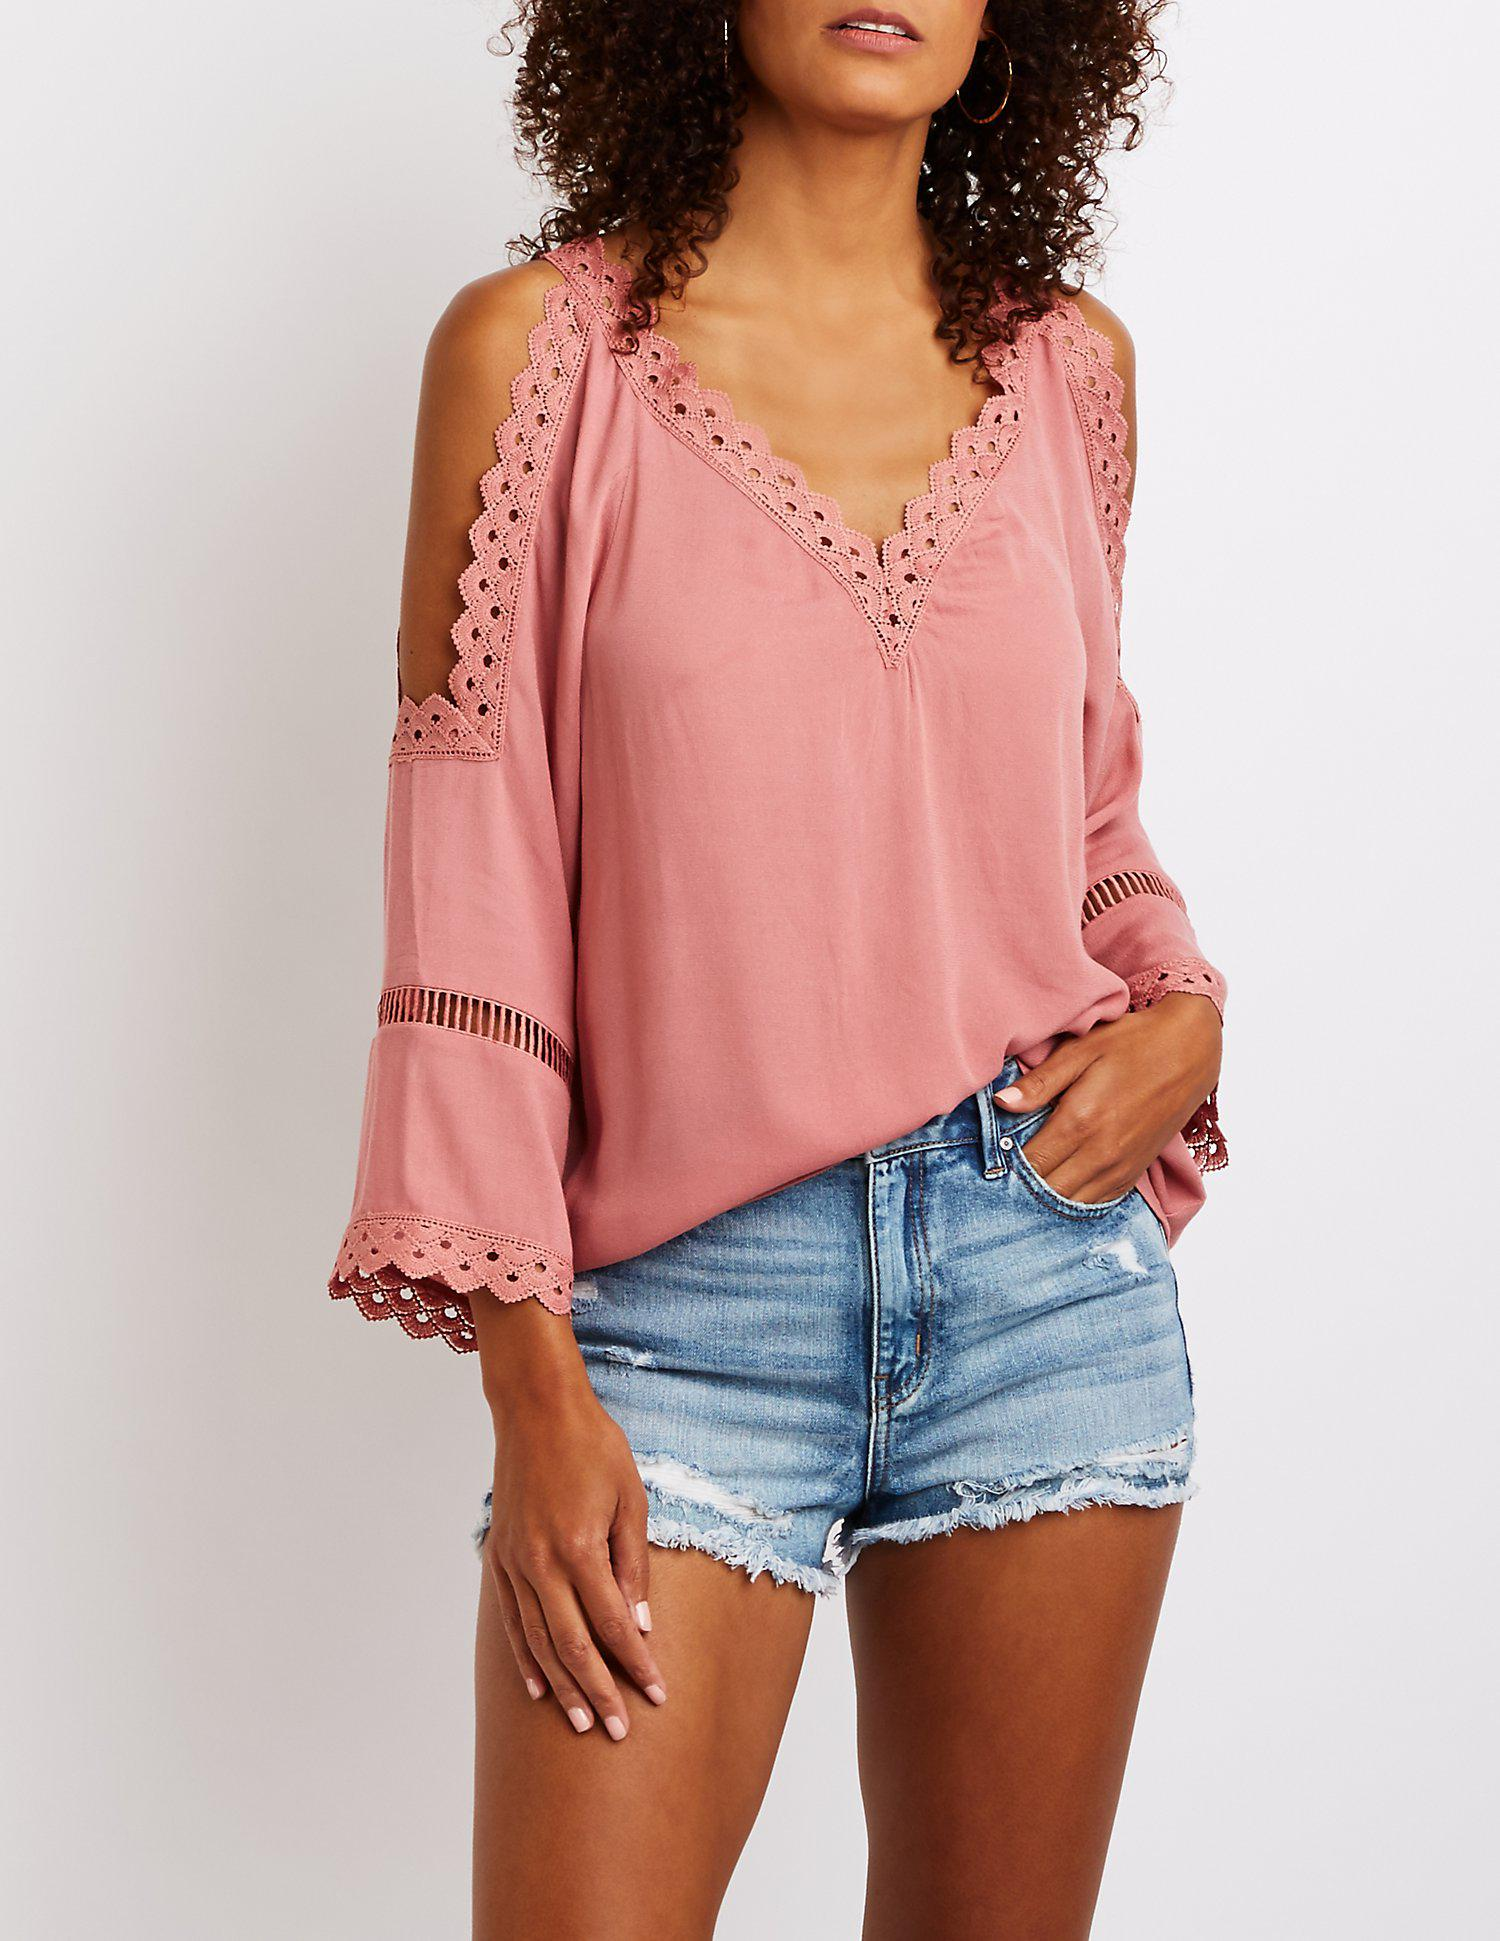 768a65c7b57d44 Lyst - Charlotte Russe Crochet Cold Shoulder Top in Purple